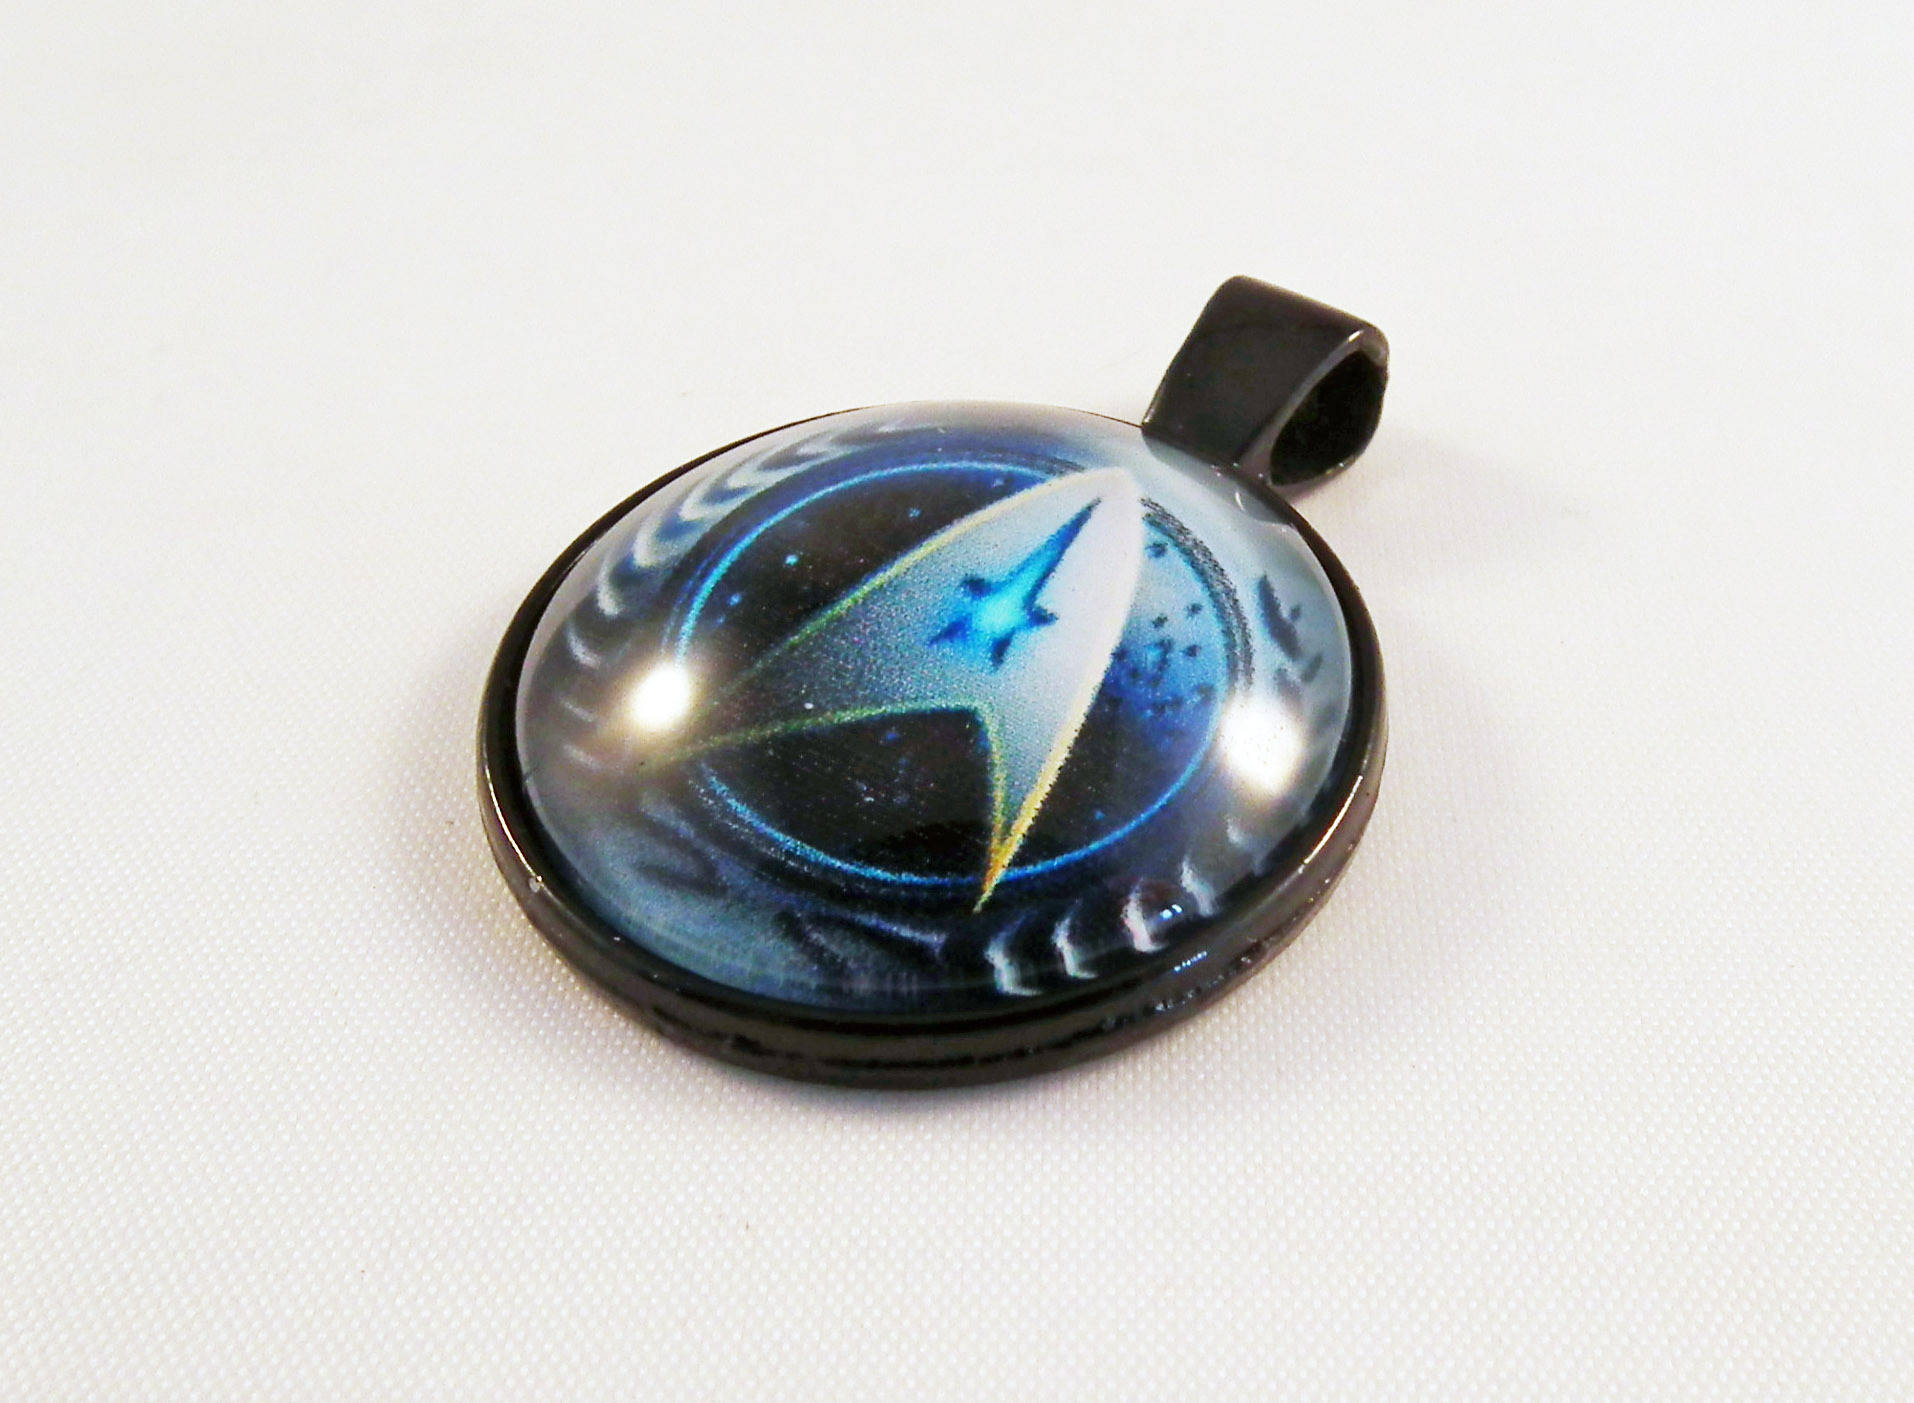 ALD2N - Pendentif Cabochon de 25mm en Verre Star Trek Starfleet Science Fiction Futur Vaisseau Spatial Espace Galaxie